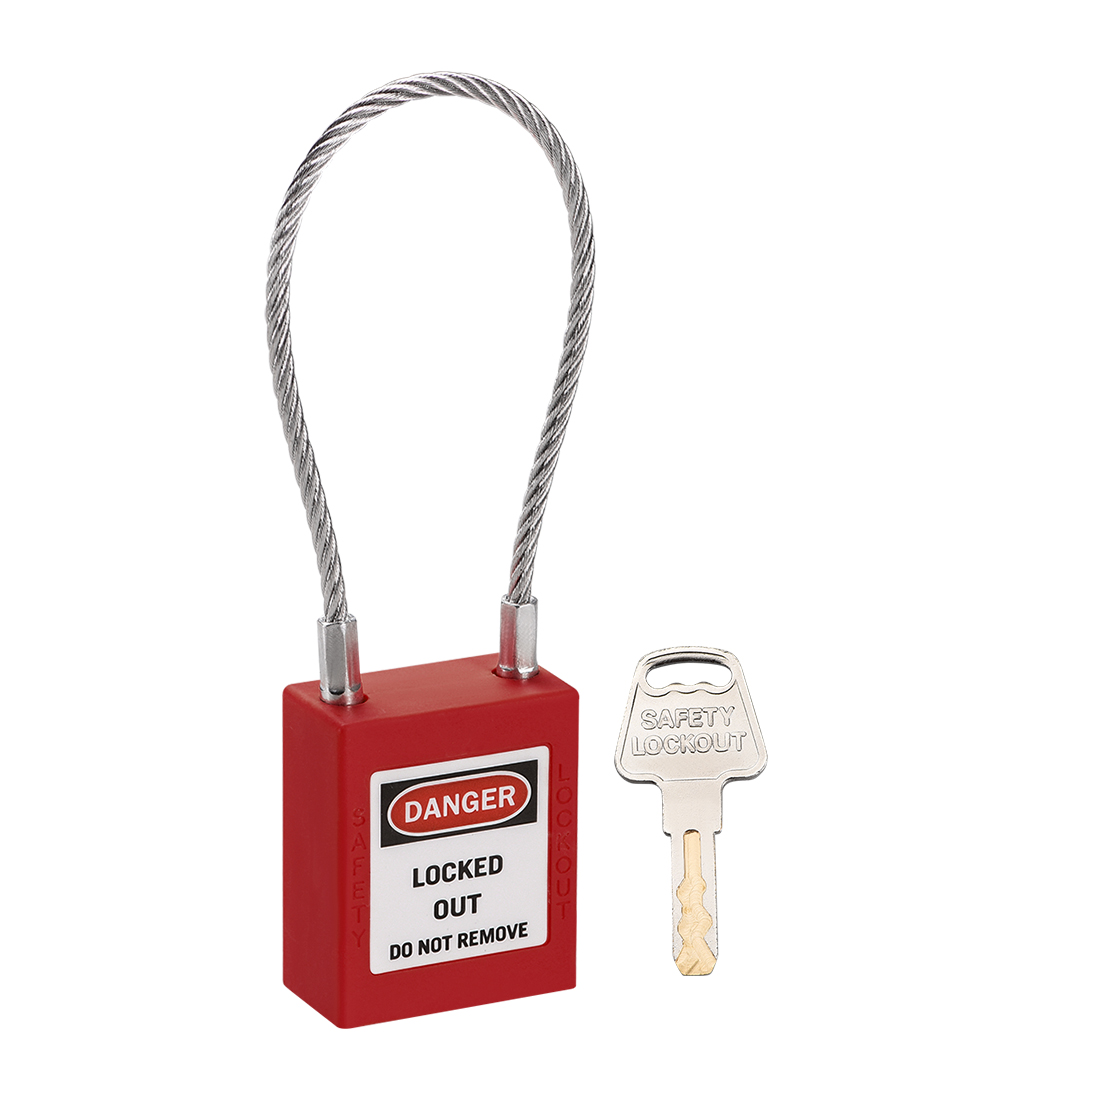 Lockout Tagout Locks 3.3 Inch Shackle Key Alike Safety Padlock Plastic Lock Red